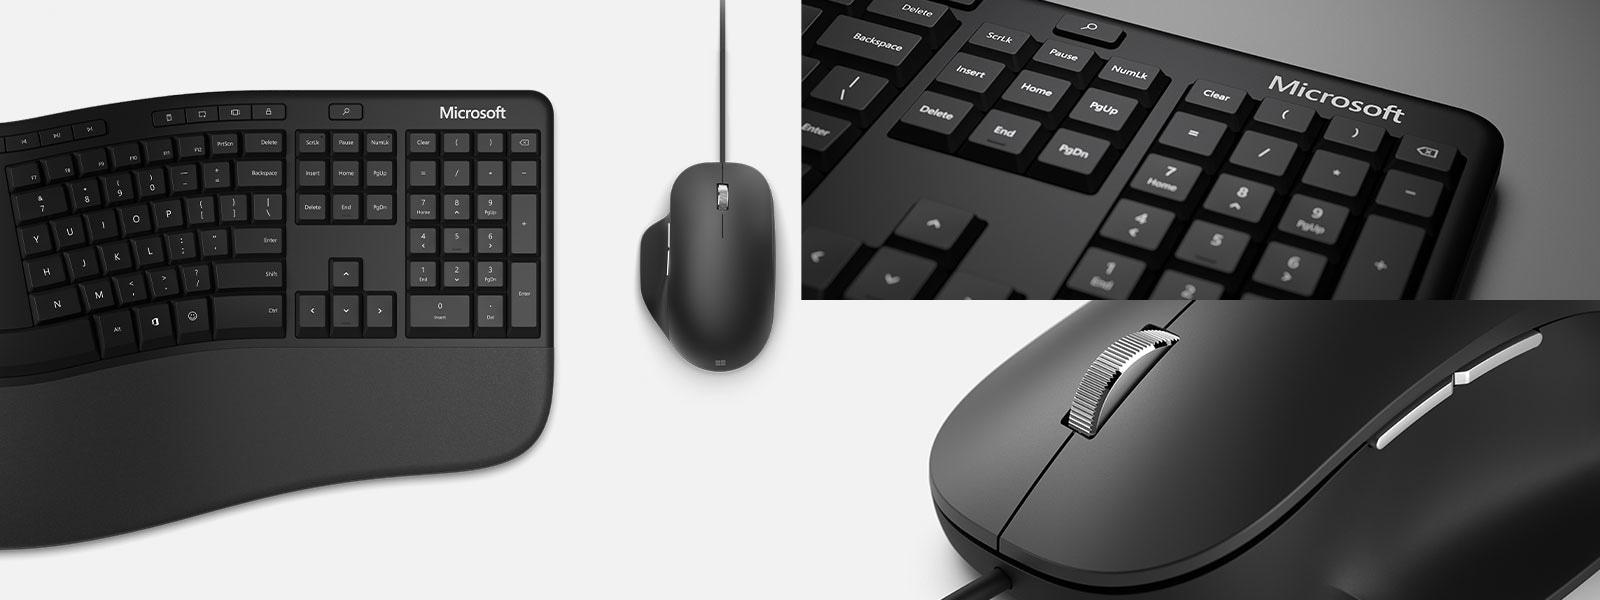 Up close details of A Microsoft Ergonomic Keyboard and a Microsoft Ergonomic Mouse.